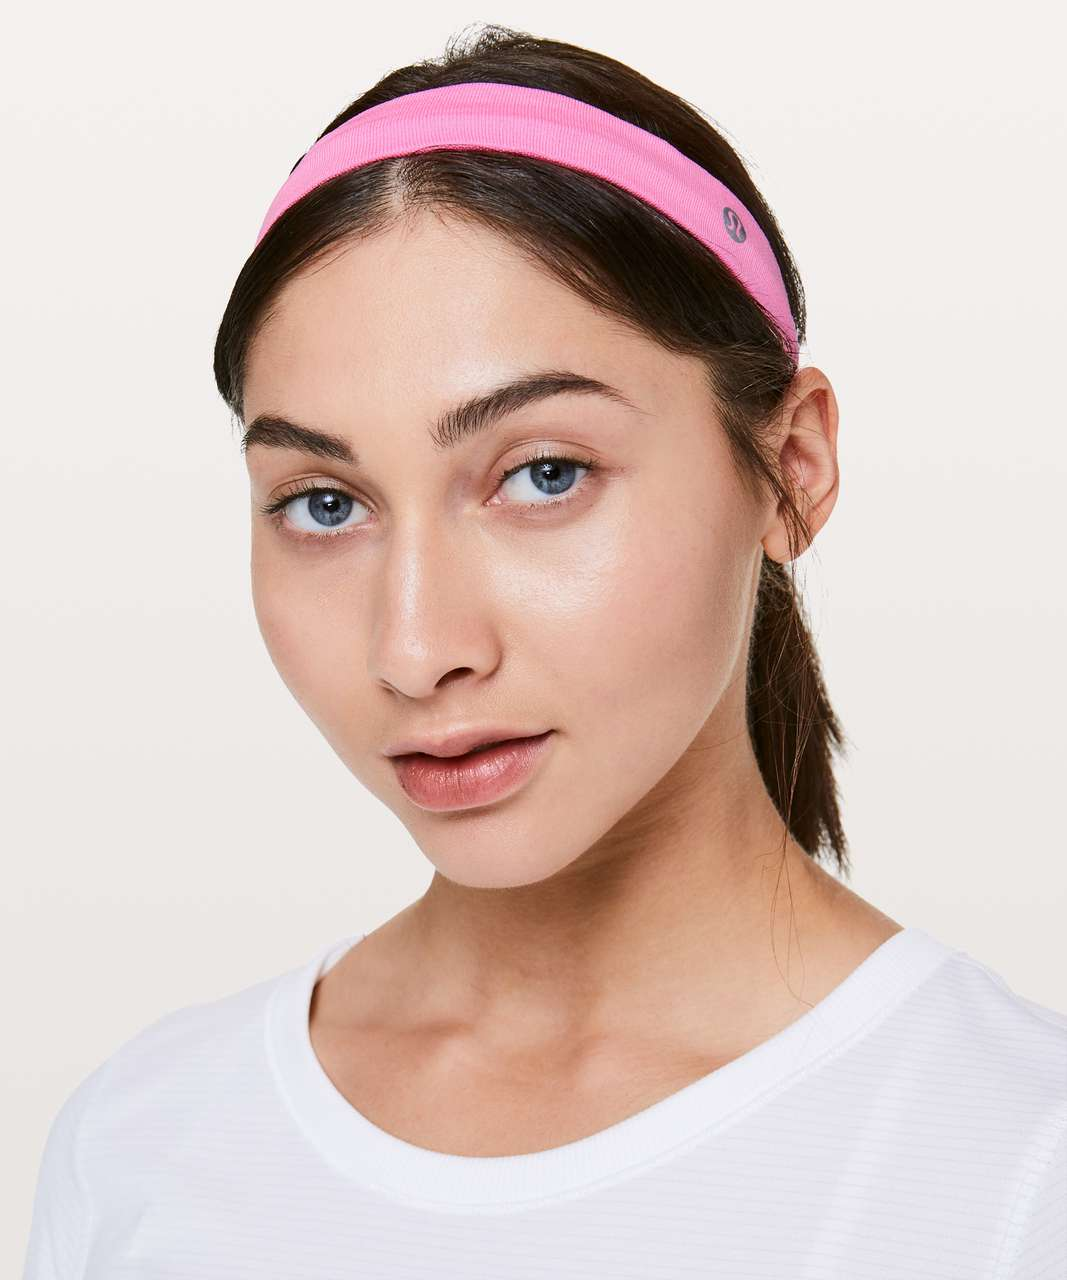 Lululemon Cardio Cross Trainer Headband - Zing Pink Light / White